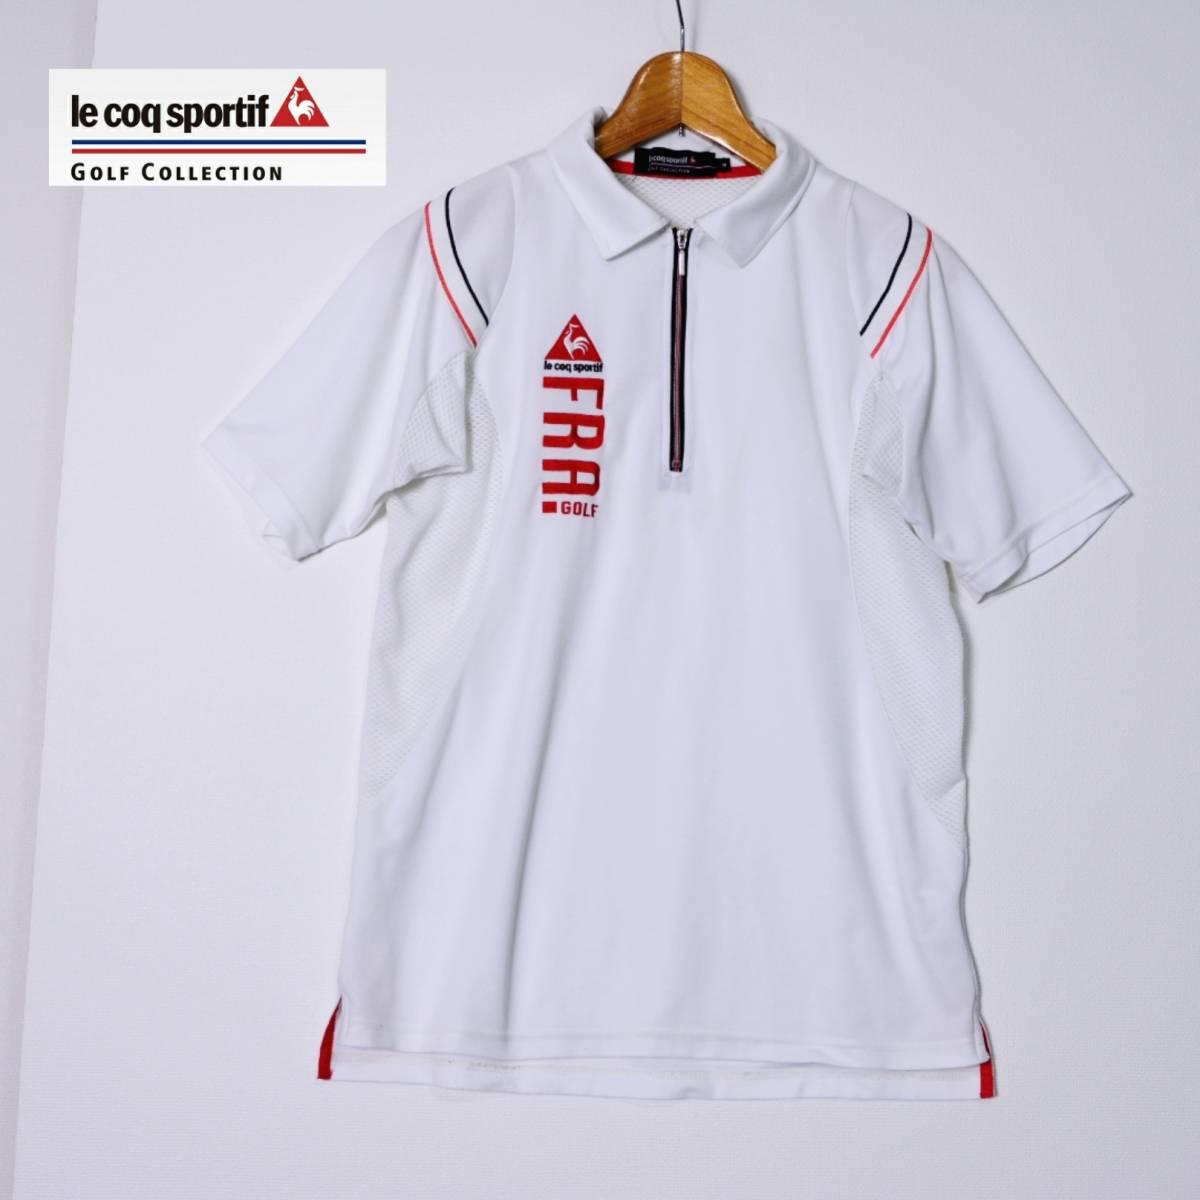 aea30a3dc567ae le coq sportif GOLF COLLECTION ルコック ゴルフ 半袖ポロシャツ ハーフジップ ロゴ刺繍 白の1